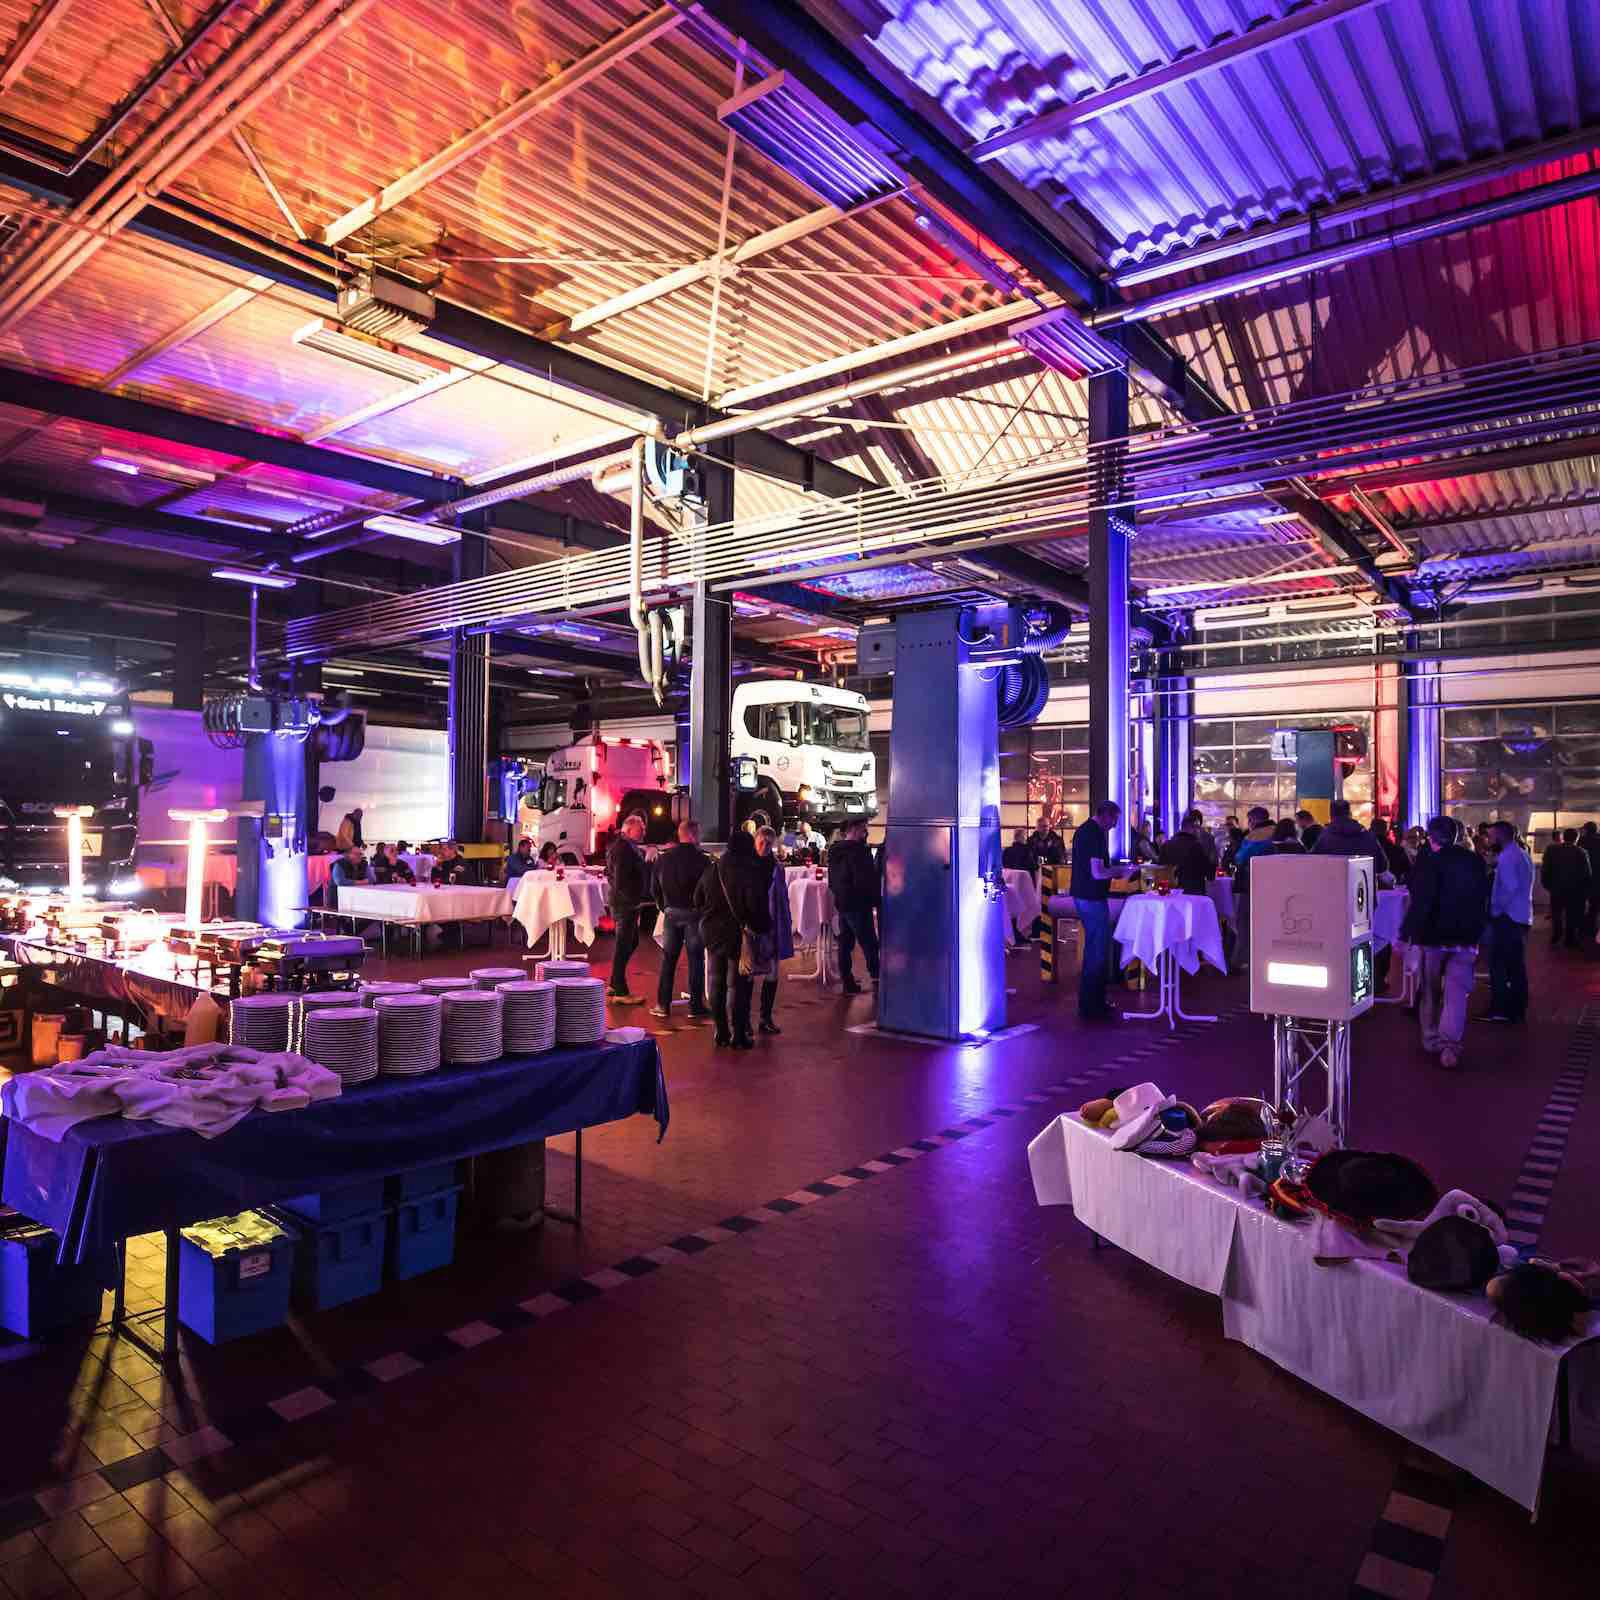 Klangfein - Lichttechnik | LED | Beleuchtung | Scheinwerfer | Konzertbeleuchtung | Fassaden | Theater | Bühne | Design | Konzept | Layout | Anfertigung | Movingheads | Projektion | Hannover